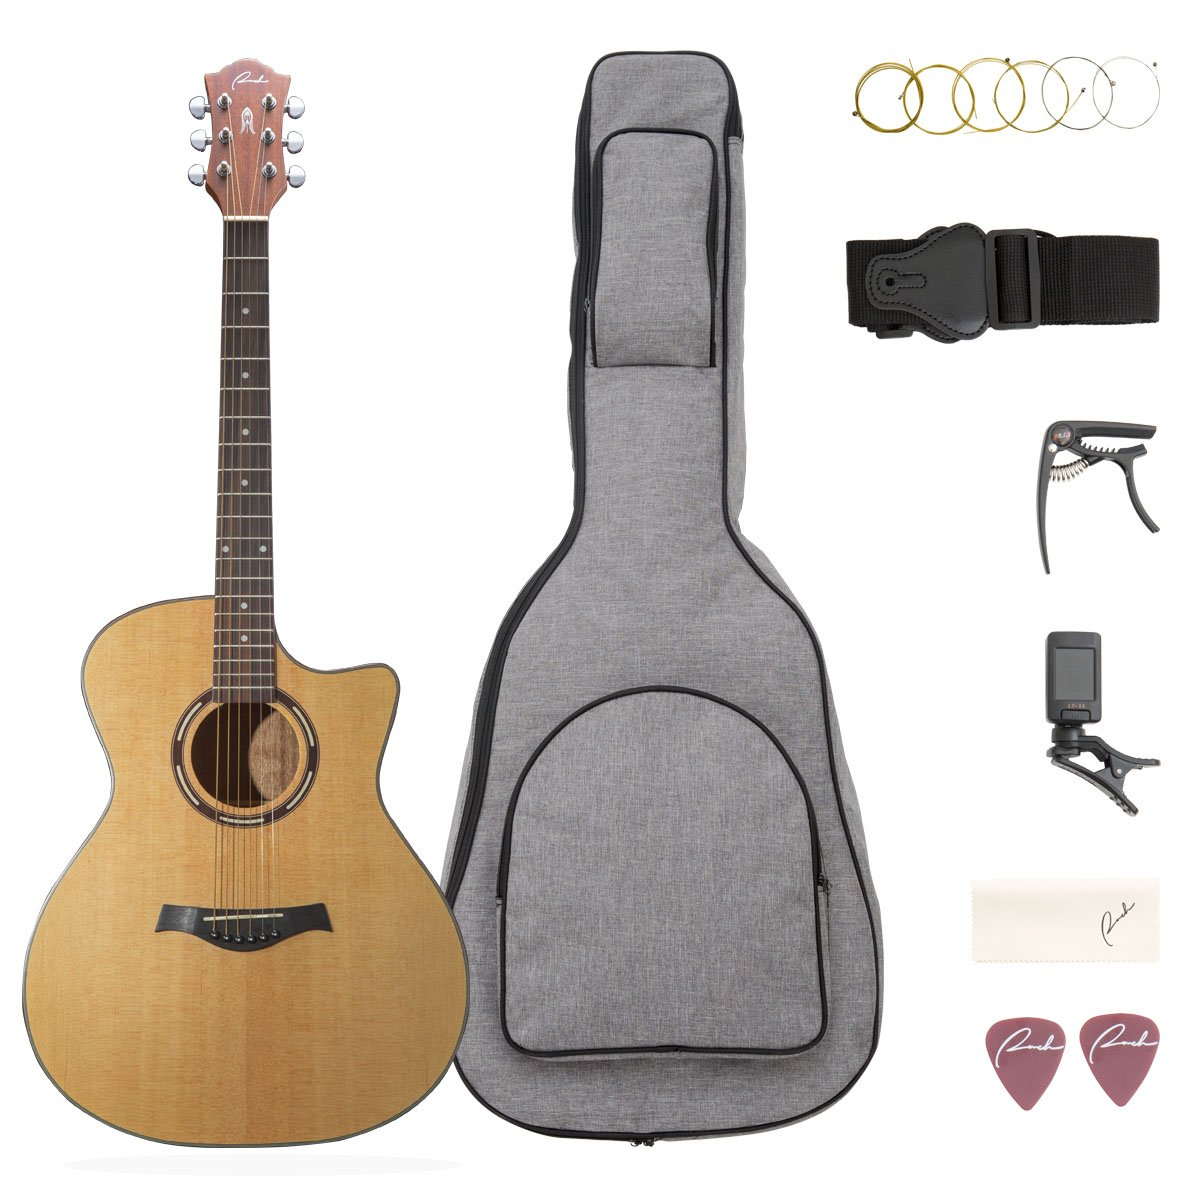 Beginner Acoustic Guitar 41'' Guitar, Cutaway Steel String Acoustic Guitar Bundle with Gig Bag, Tuner, Capo, Picks, Strings, Strap and Polishing Cloth Starter Kit